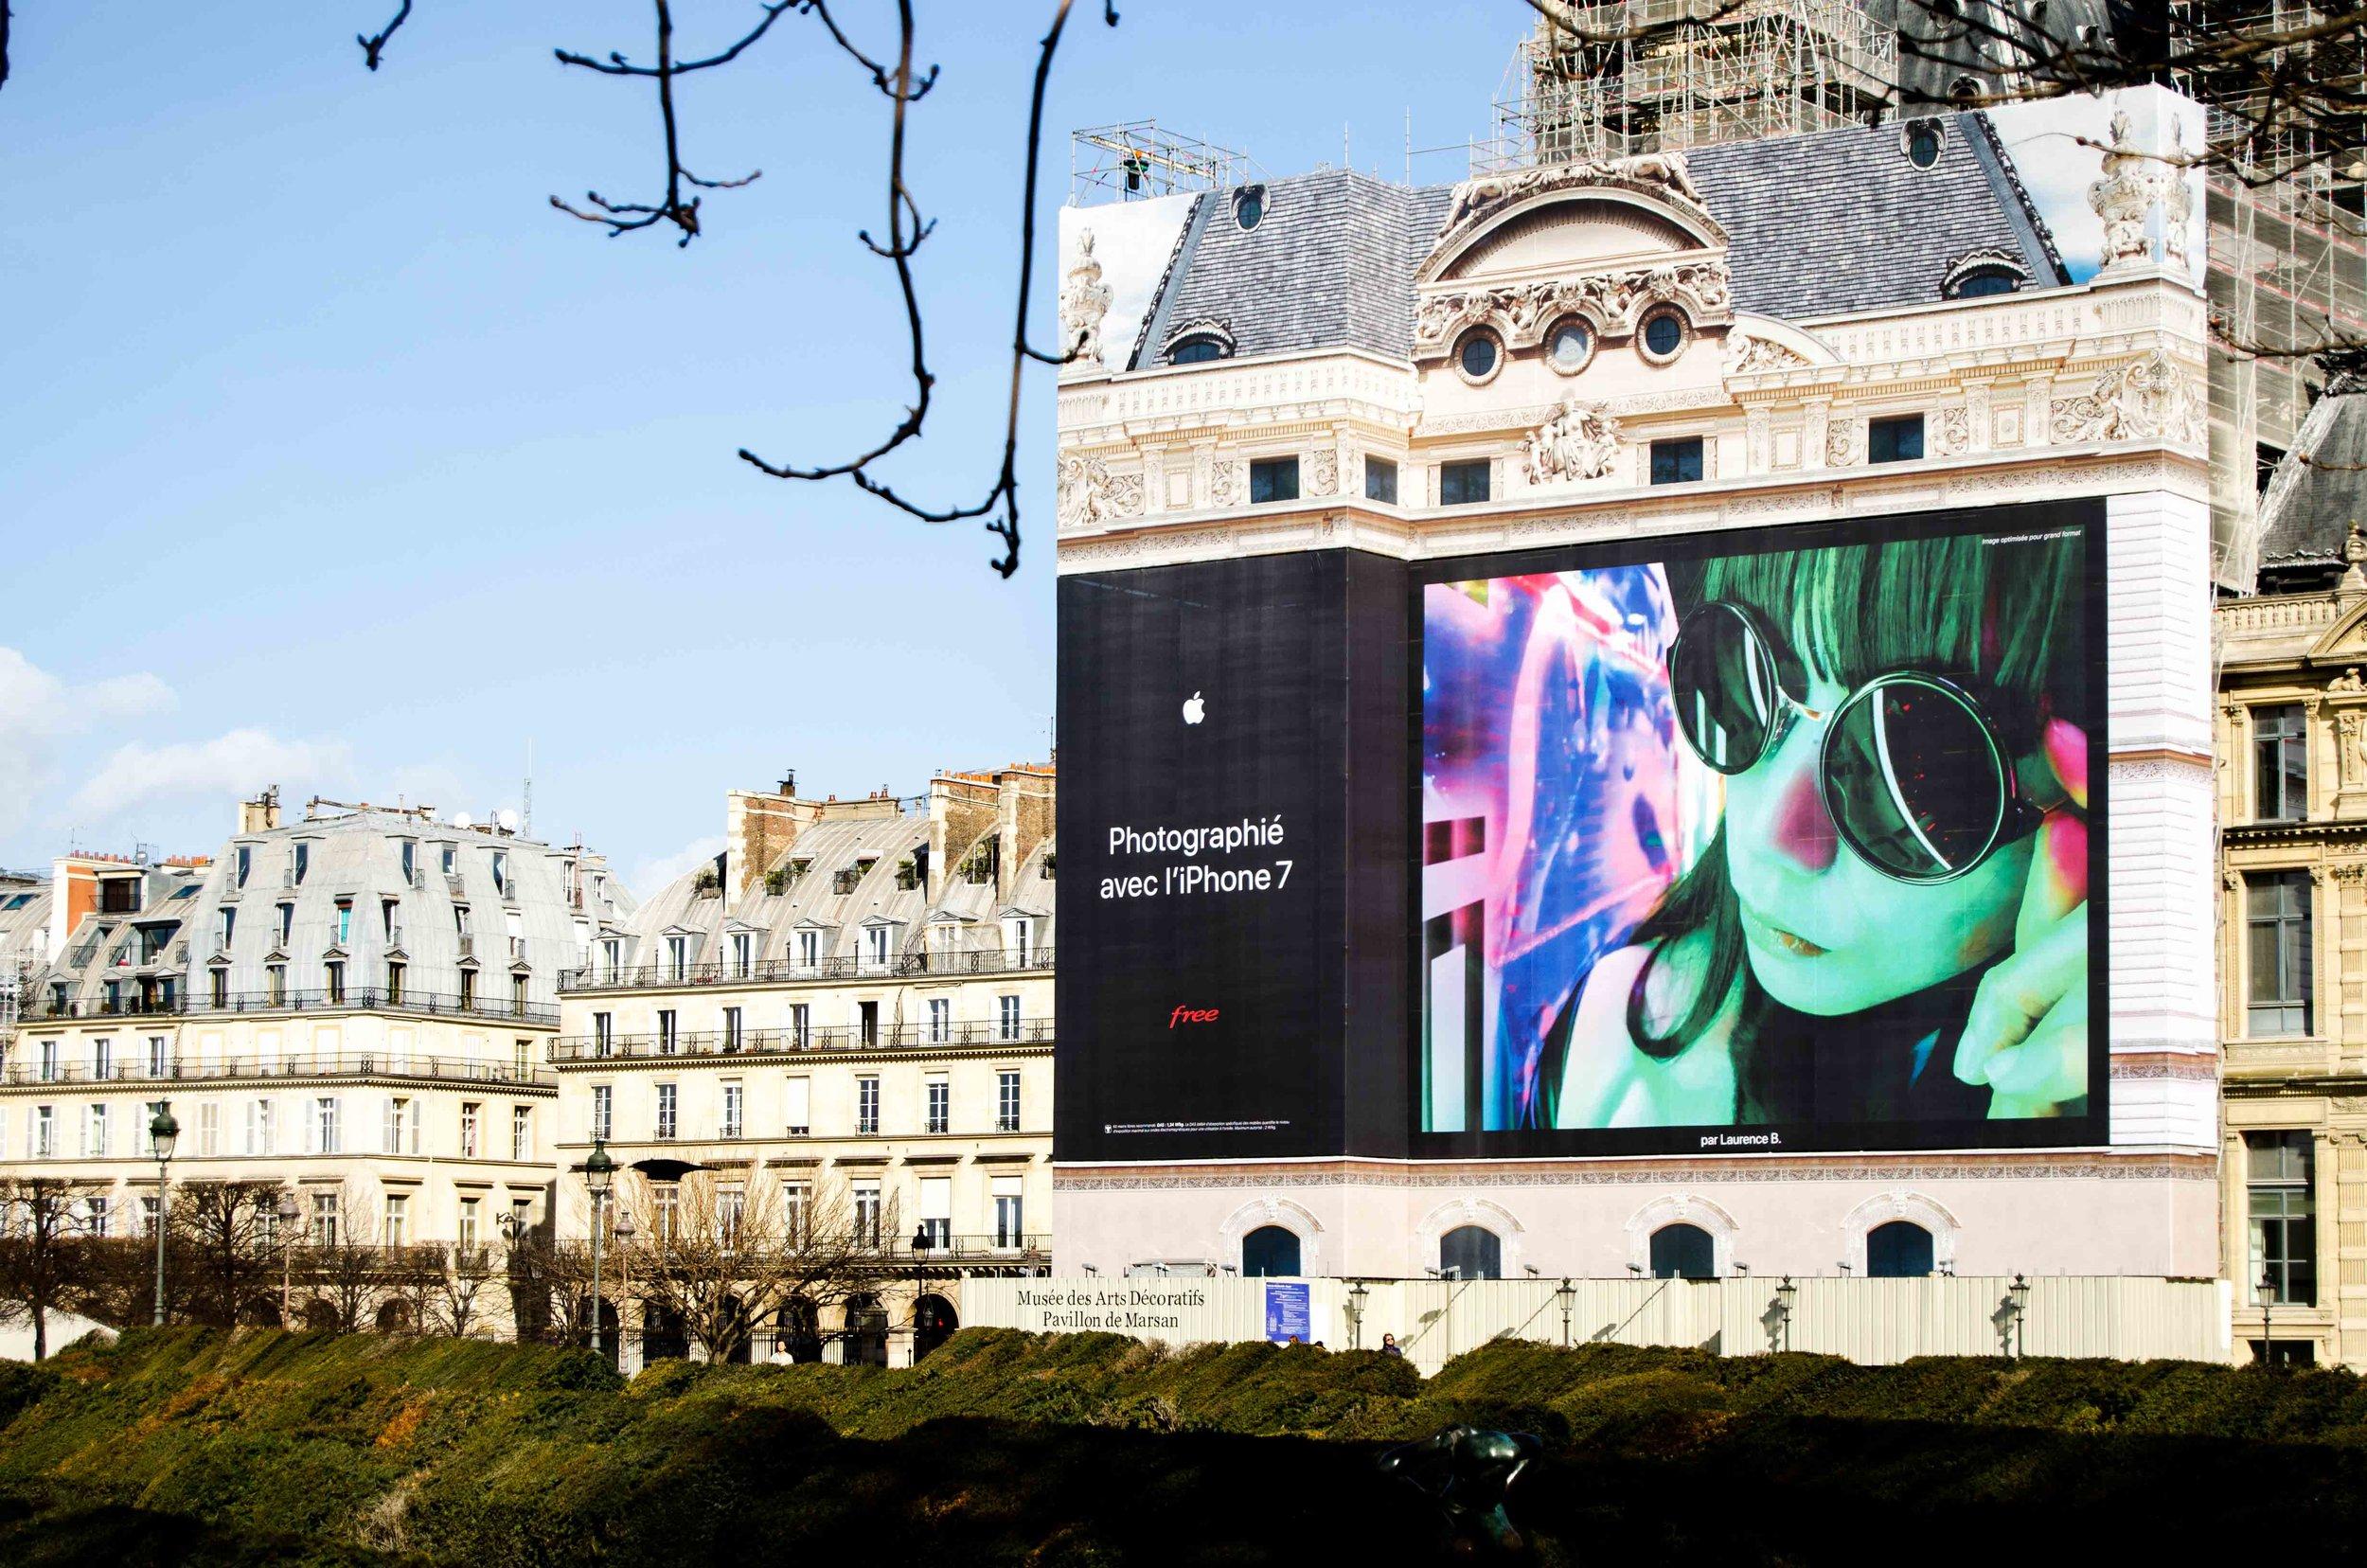 march 2 // along the Jardins des Tuileries